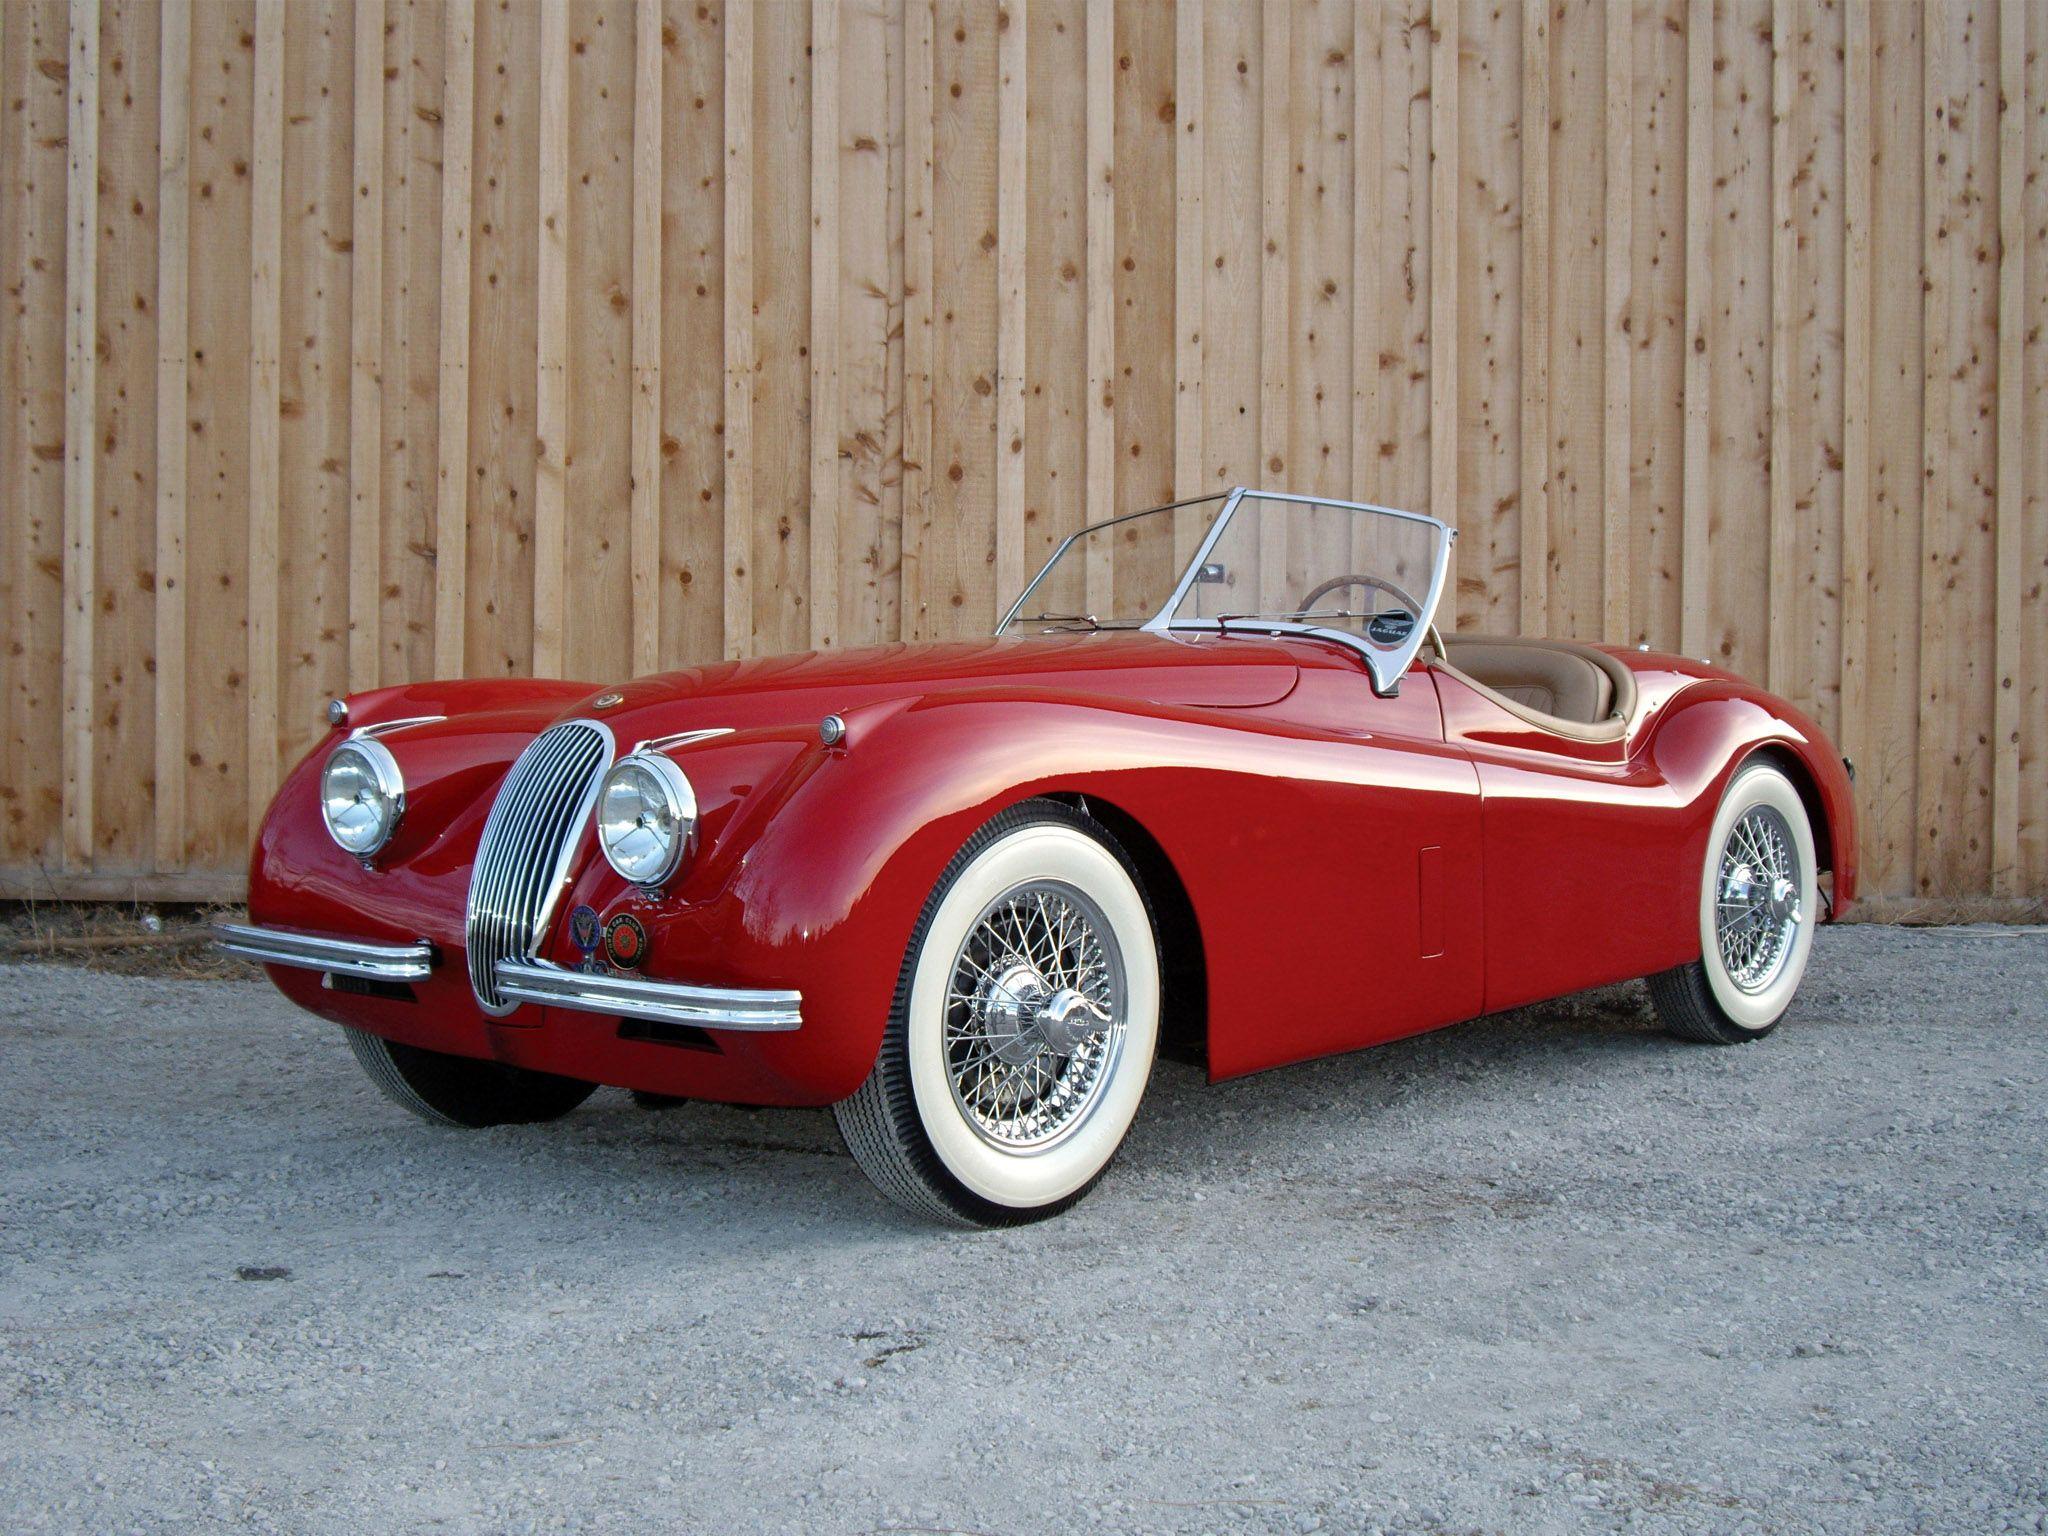 1949 Jaguar Xk 120 Roadster X K Retro Sportcar G Wallpaper 2048x1536 104858 Wallpaperup Jaguar Xk Roadsters Classic Cars